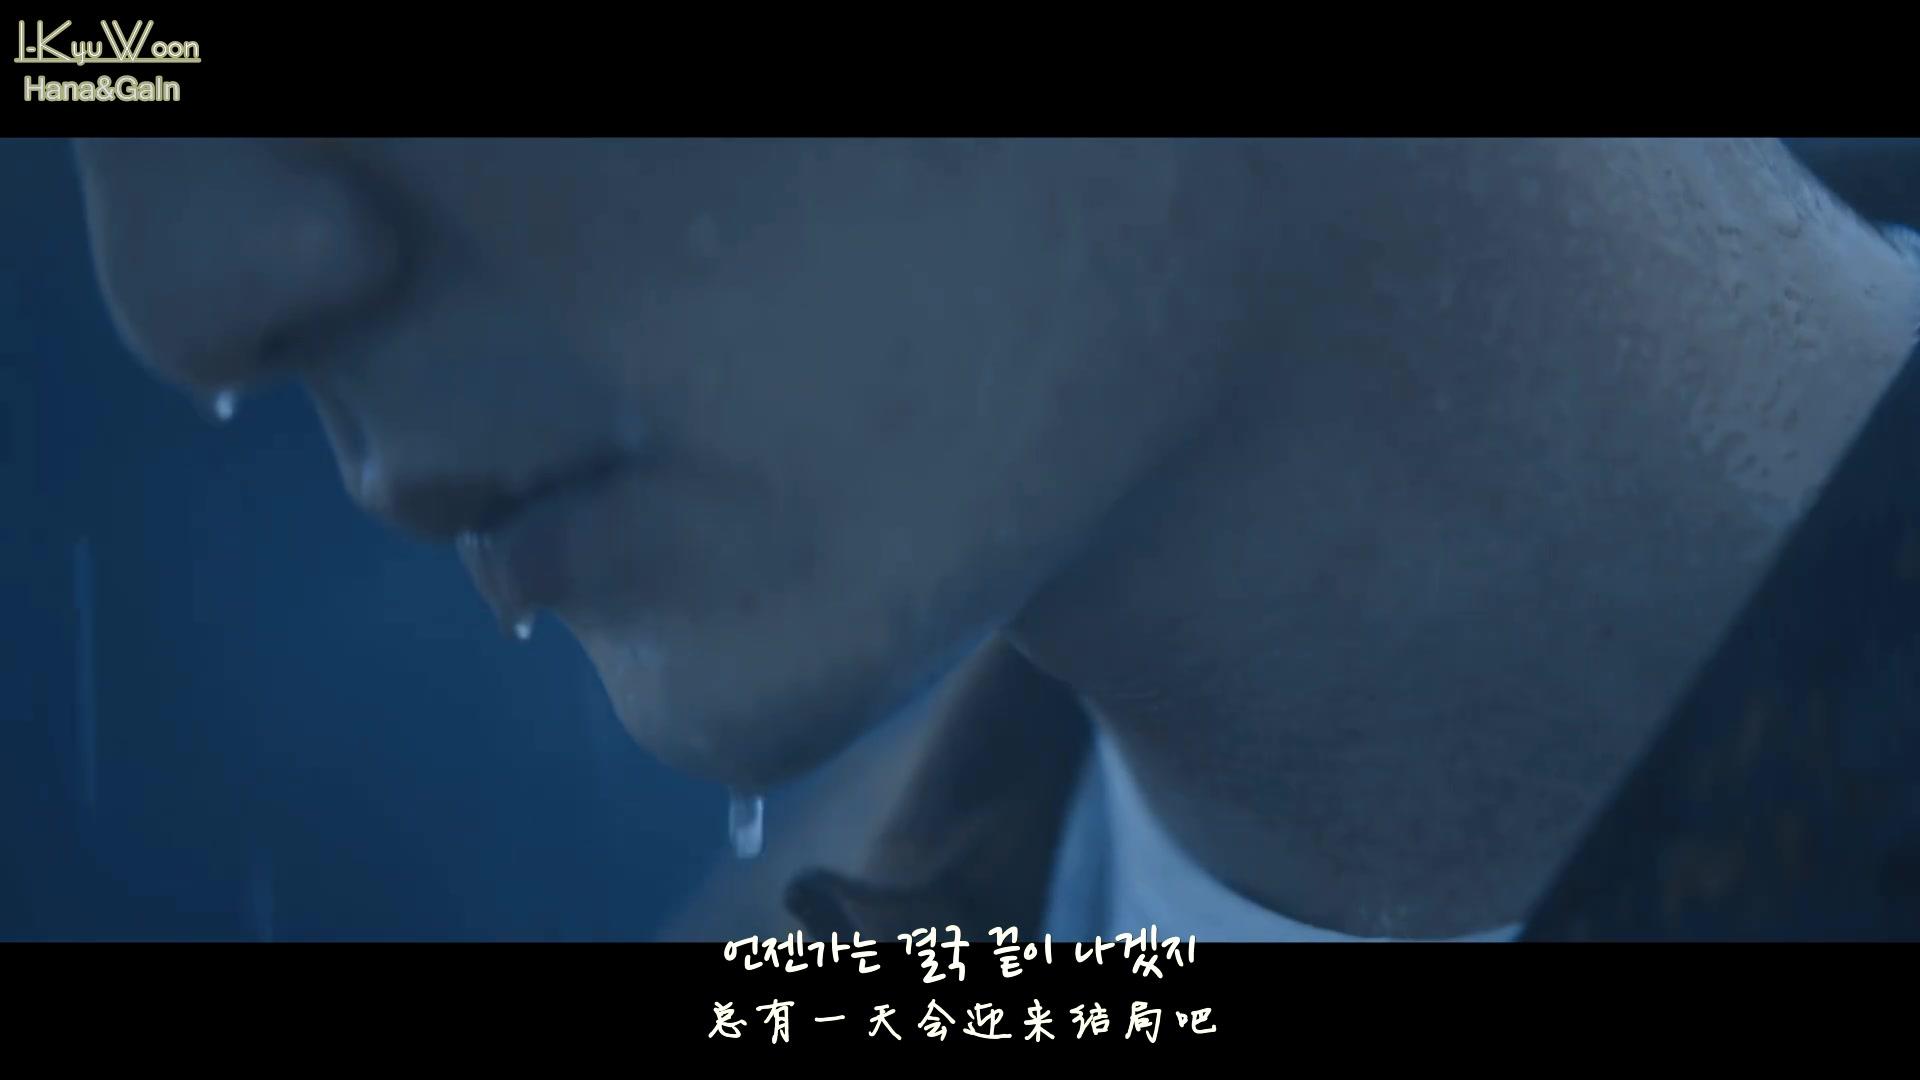 [i-KyuWoon字幕组] Roy Kim - 活下去 (Linger On)  MV 中韩字幕